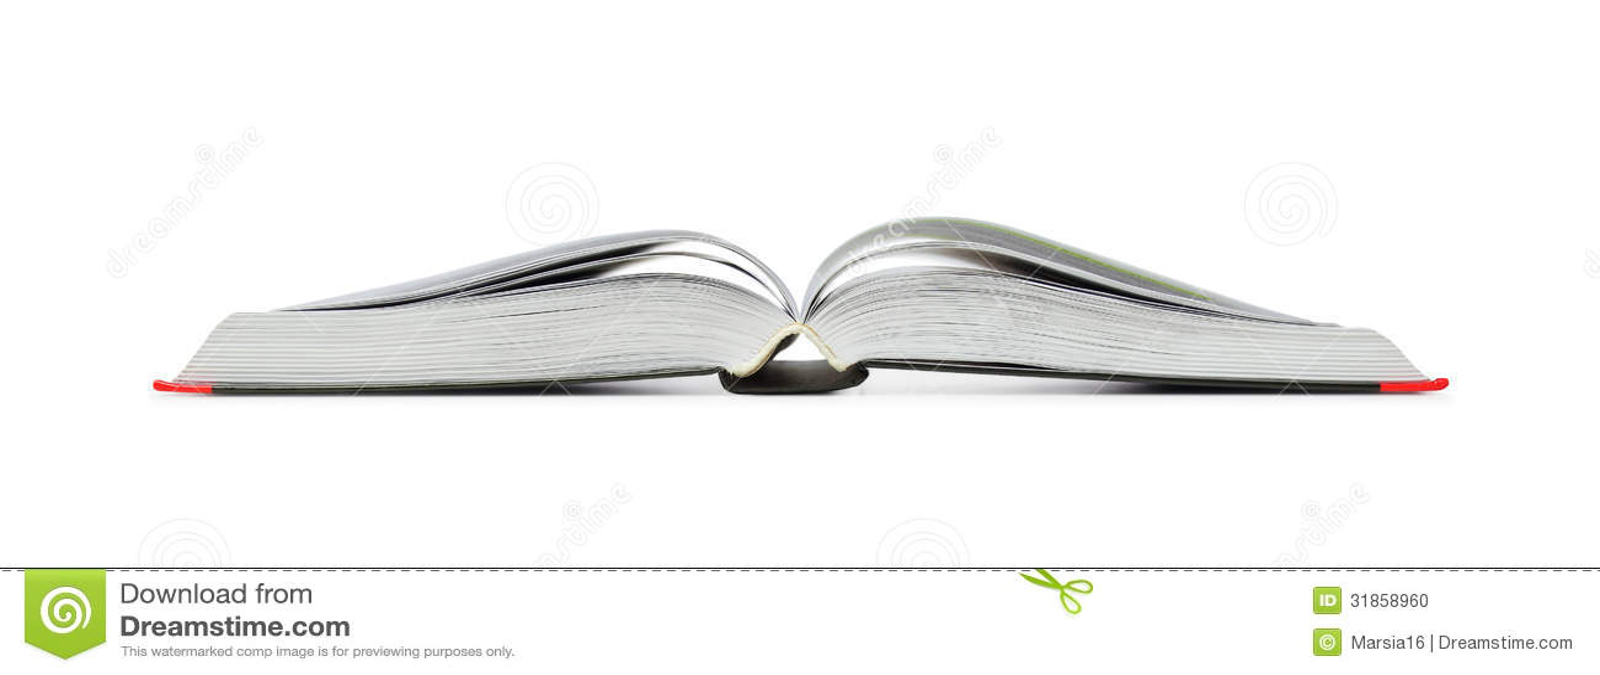 Öppna boken